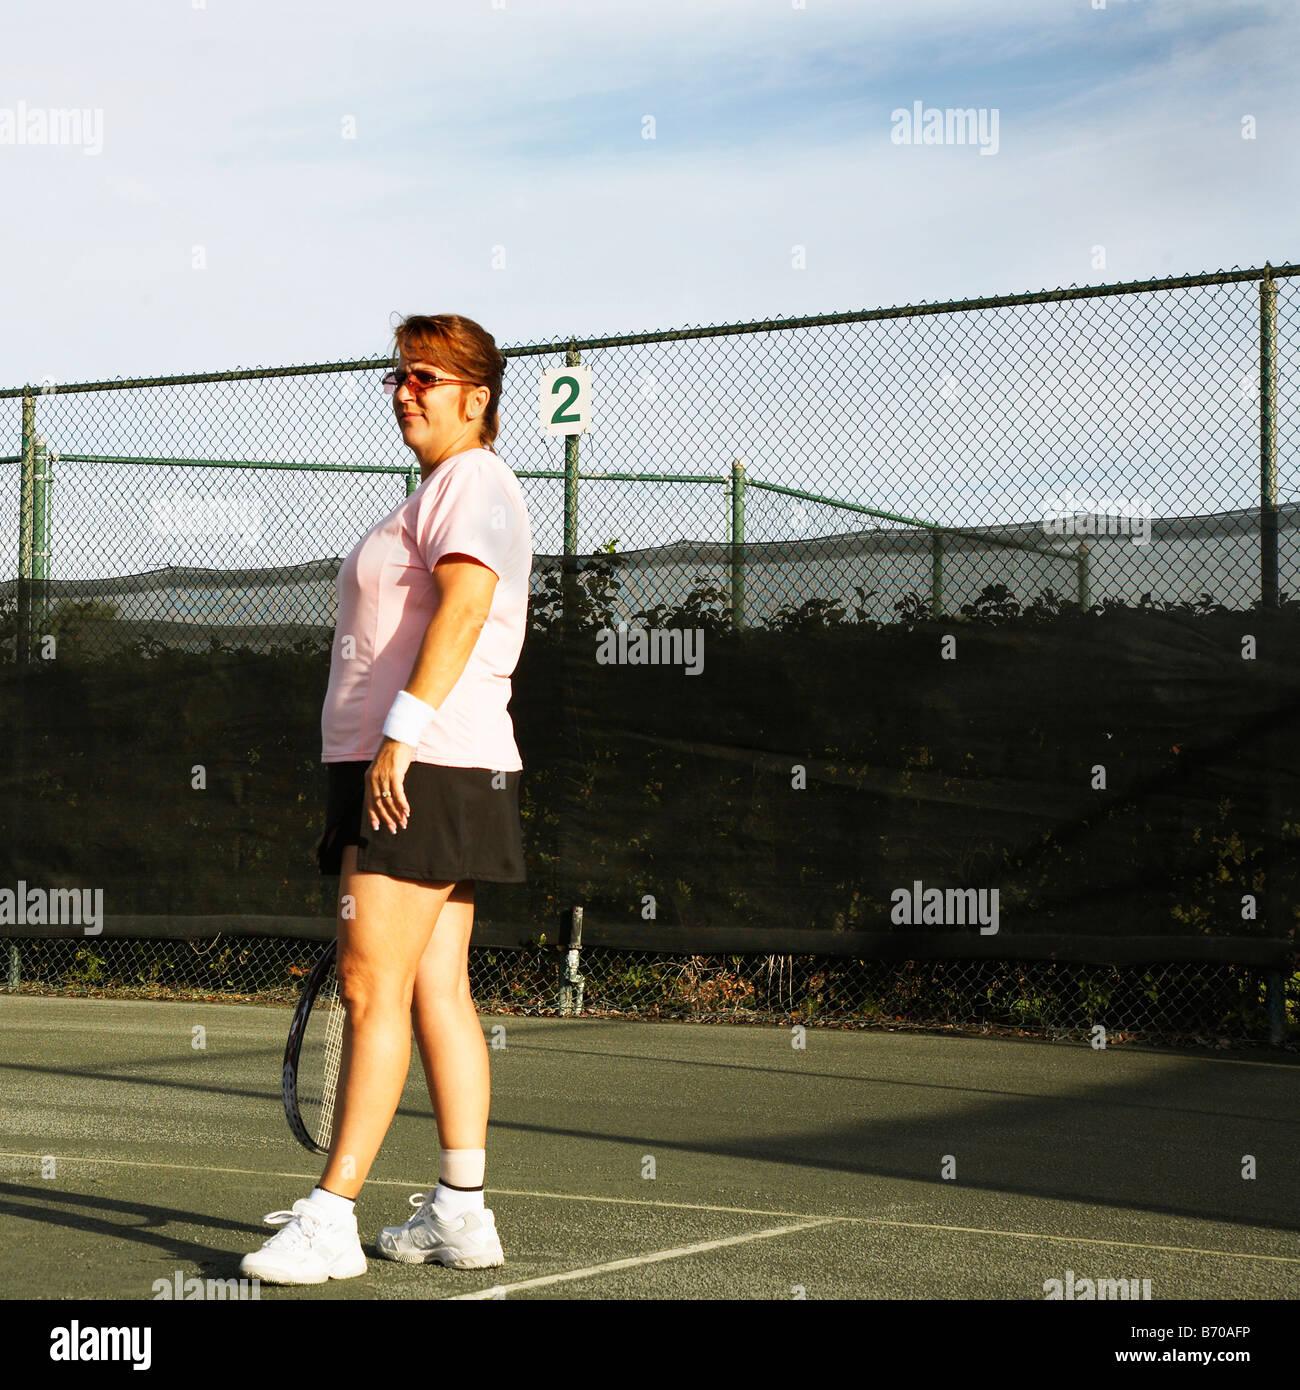 Woman playing tennis in Ft. Pierce, Florida. - Stock Image